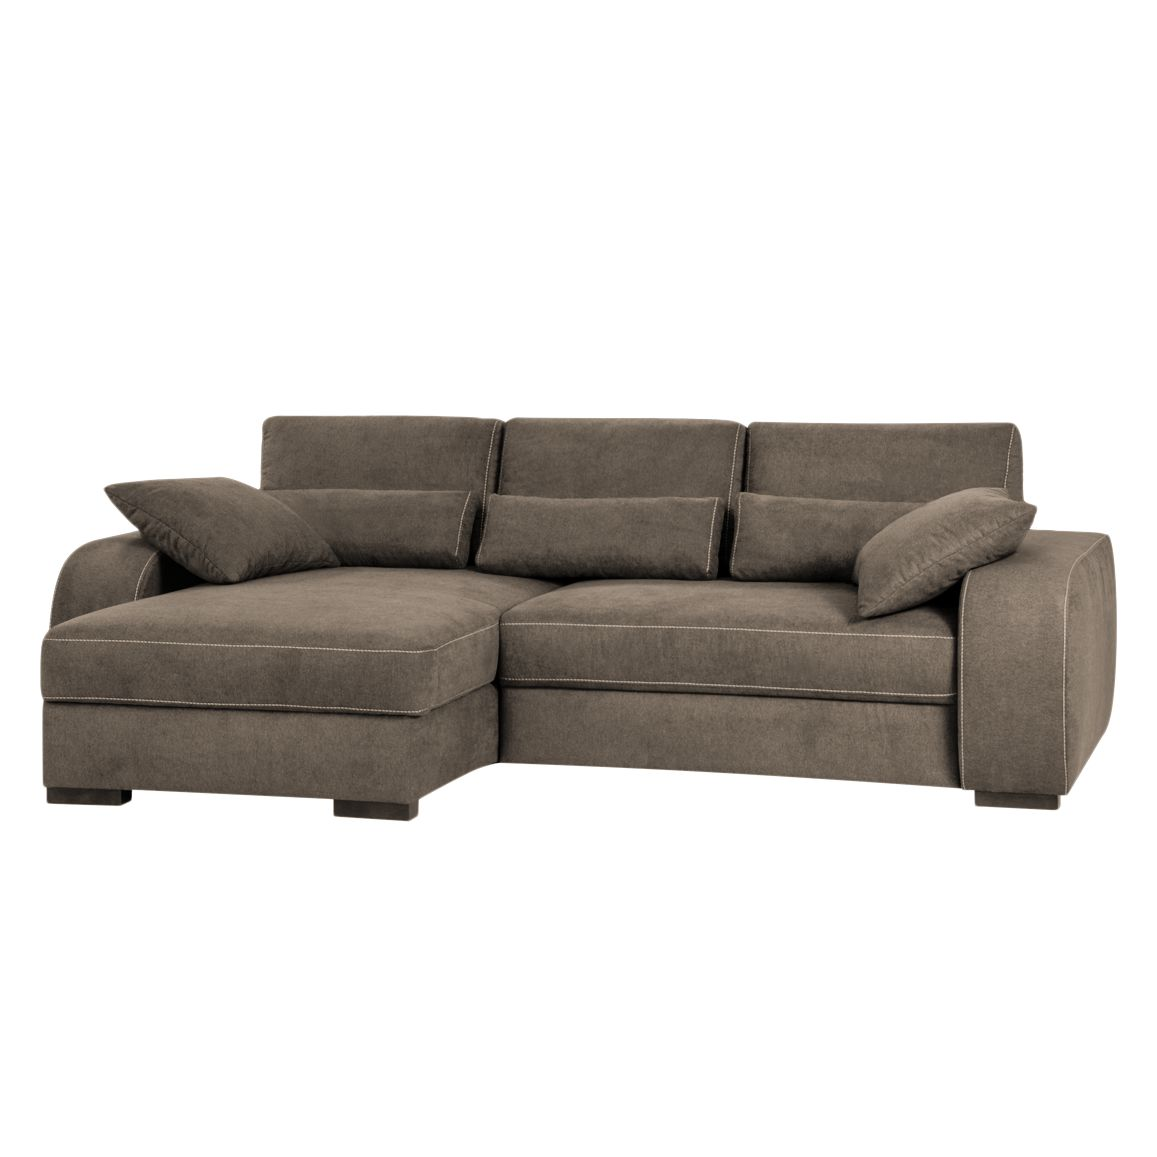 Canapé d'angle capitonné Comox